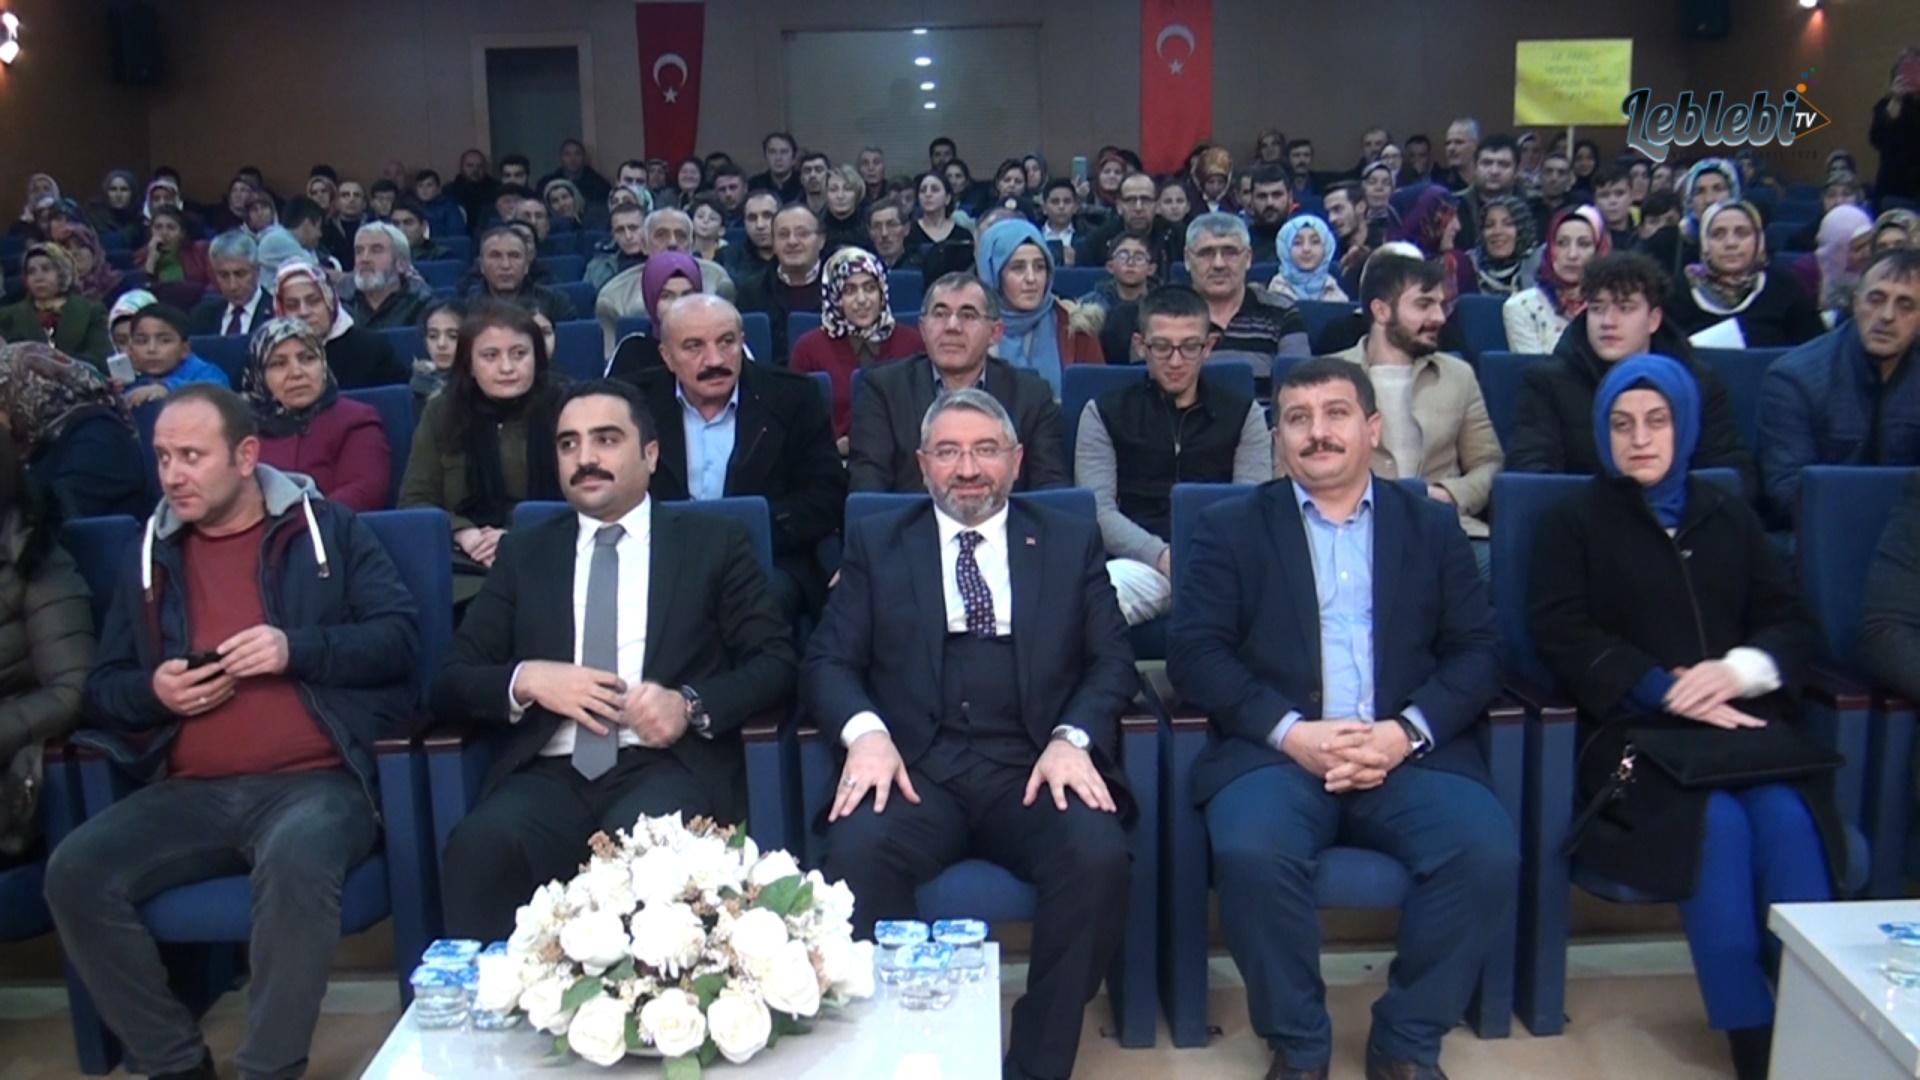 AK PARTİ MAHALLE DANIŞMA MECLİS TOPLANTISI GERÇEKLEŞTİRİLDİ